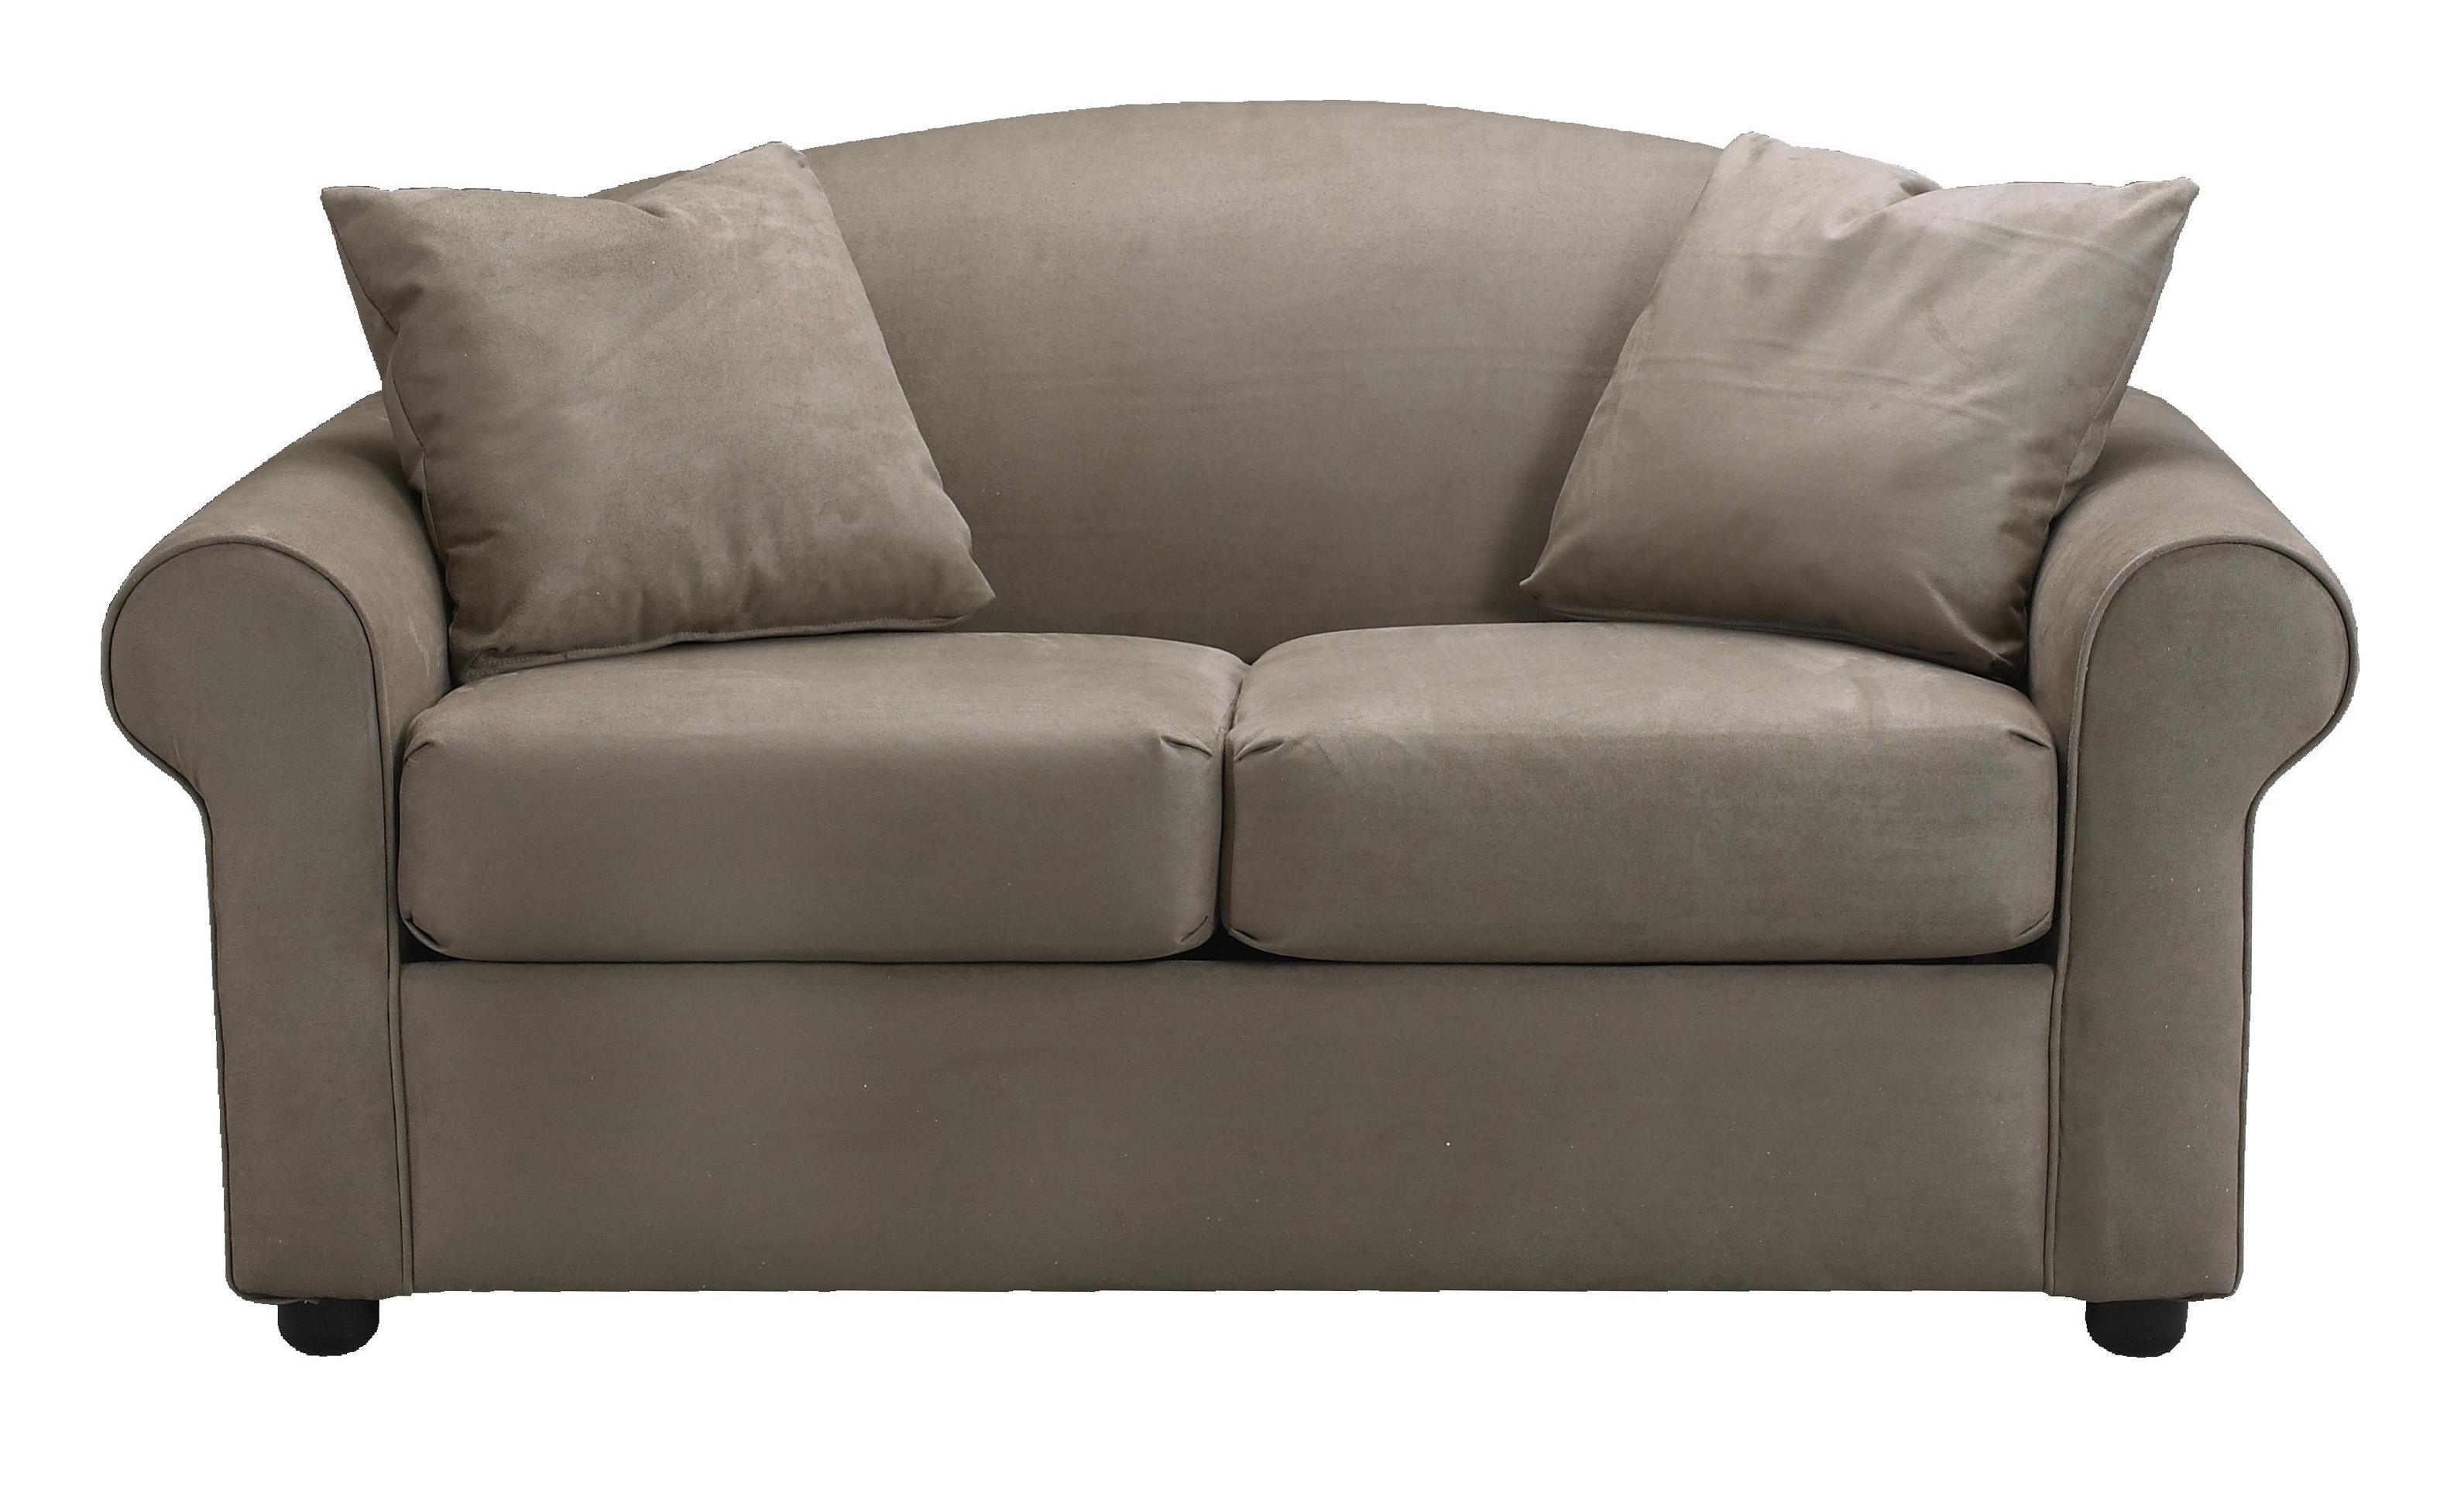 White Leather Sofa Loveseat Sleeper Sofa http padrebeachhouse net